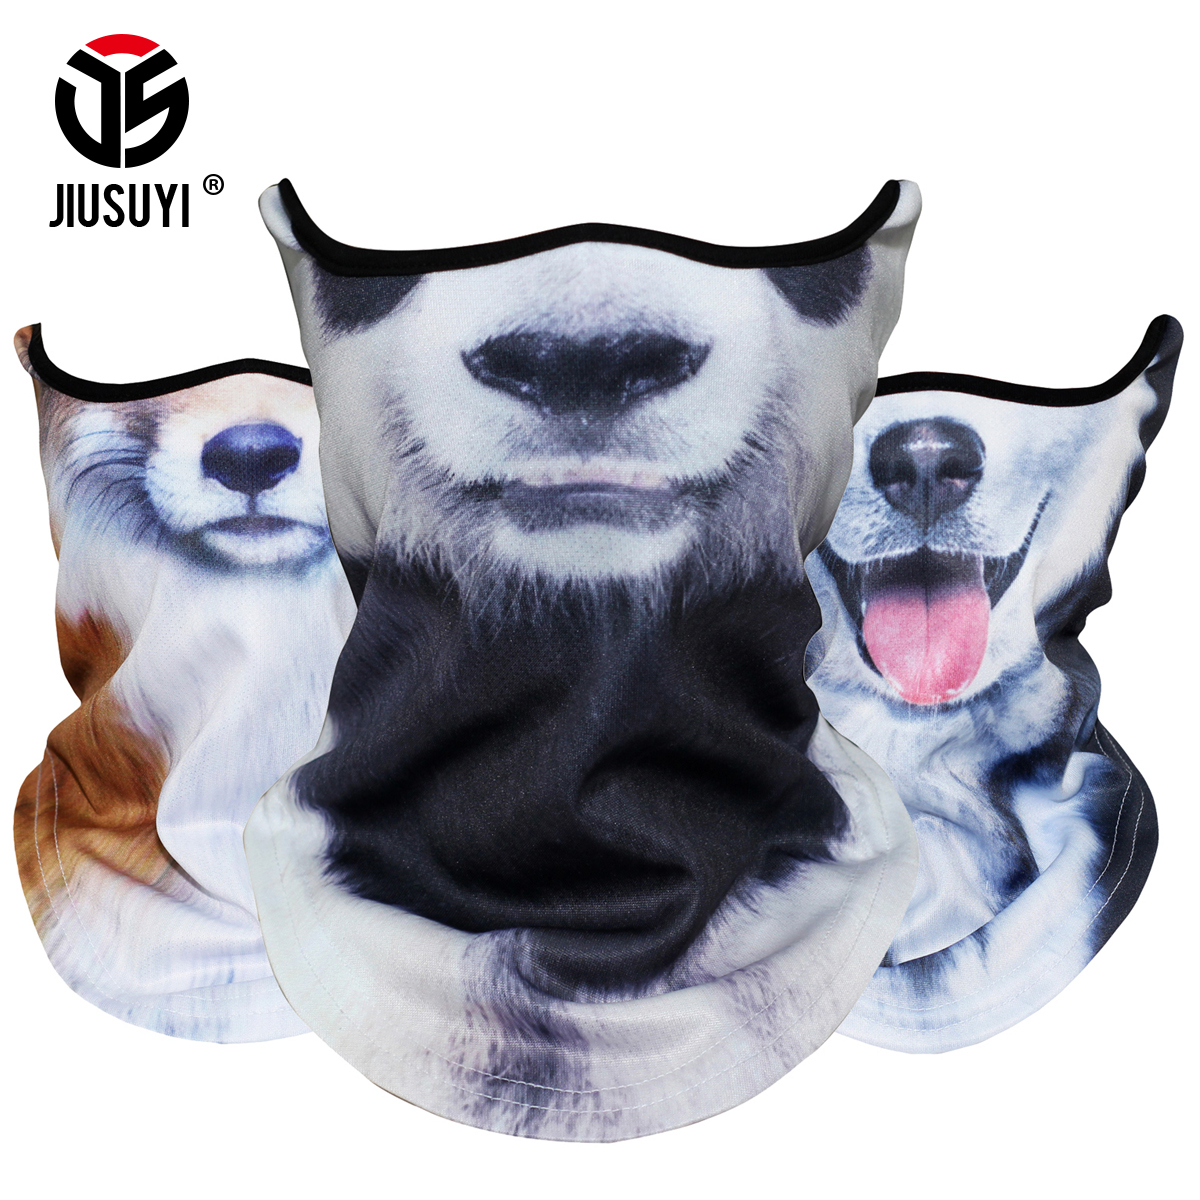 3D Animal Scarf Neck Warmer Tube Bicycle Winter Snowboard Balaclava Halloween Headband Party Dog Panda Windproof Men Women 2020